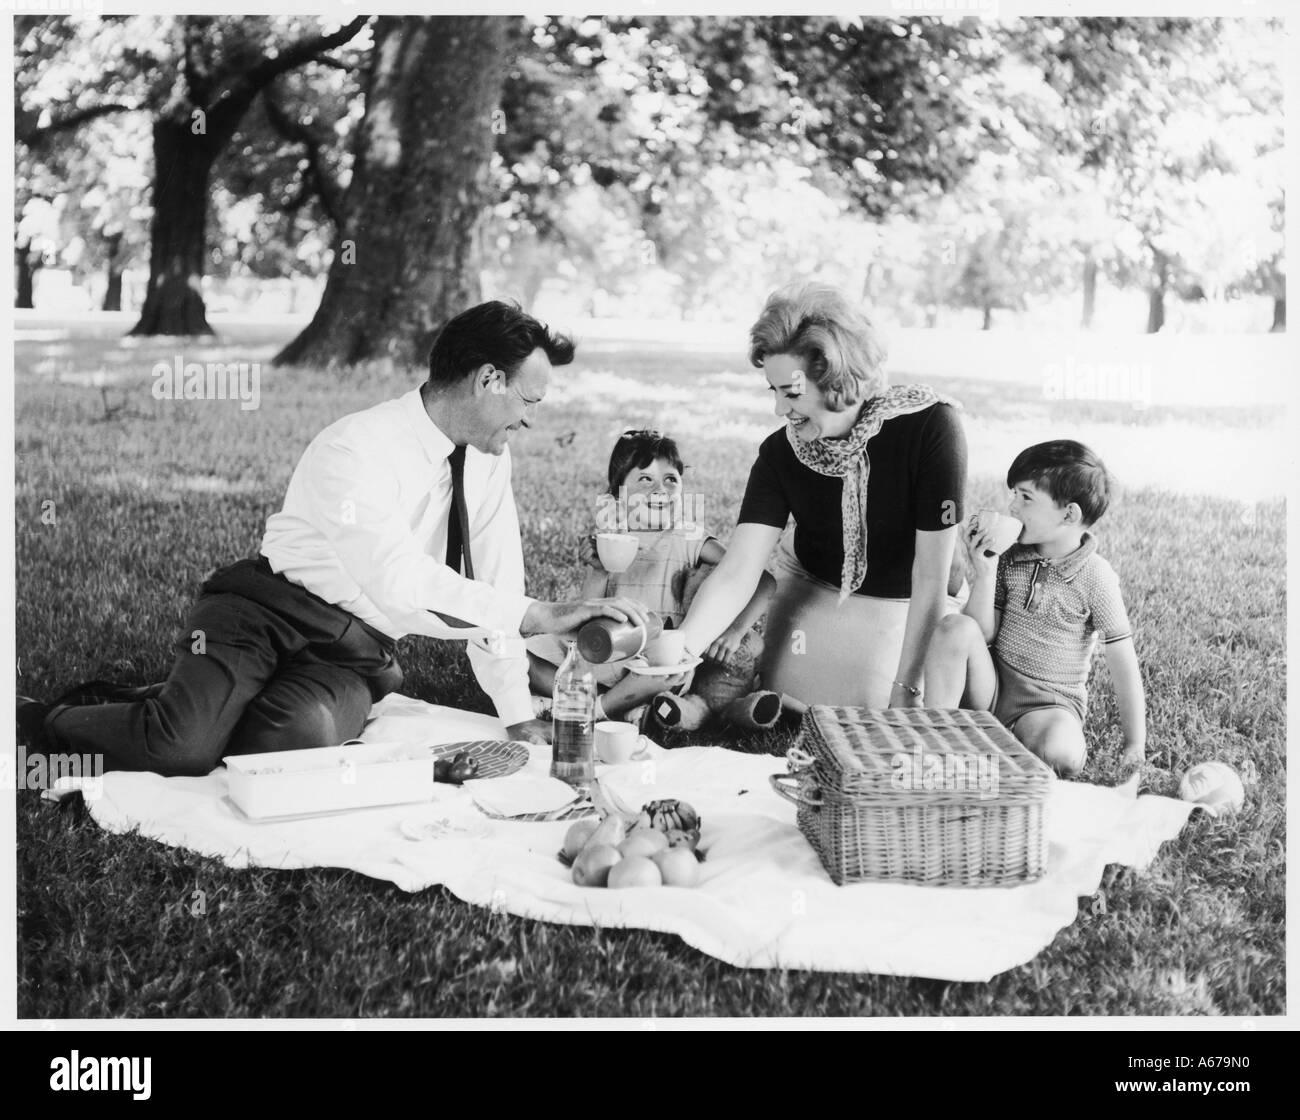 pique-nique-en-famille-1960-a679n0.jpg